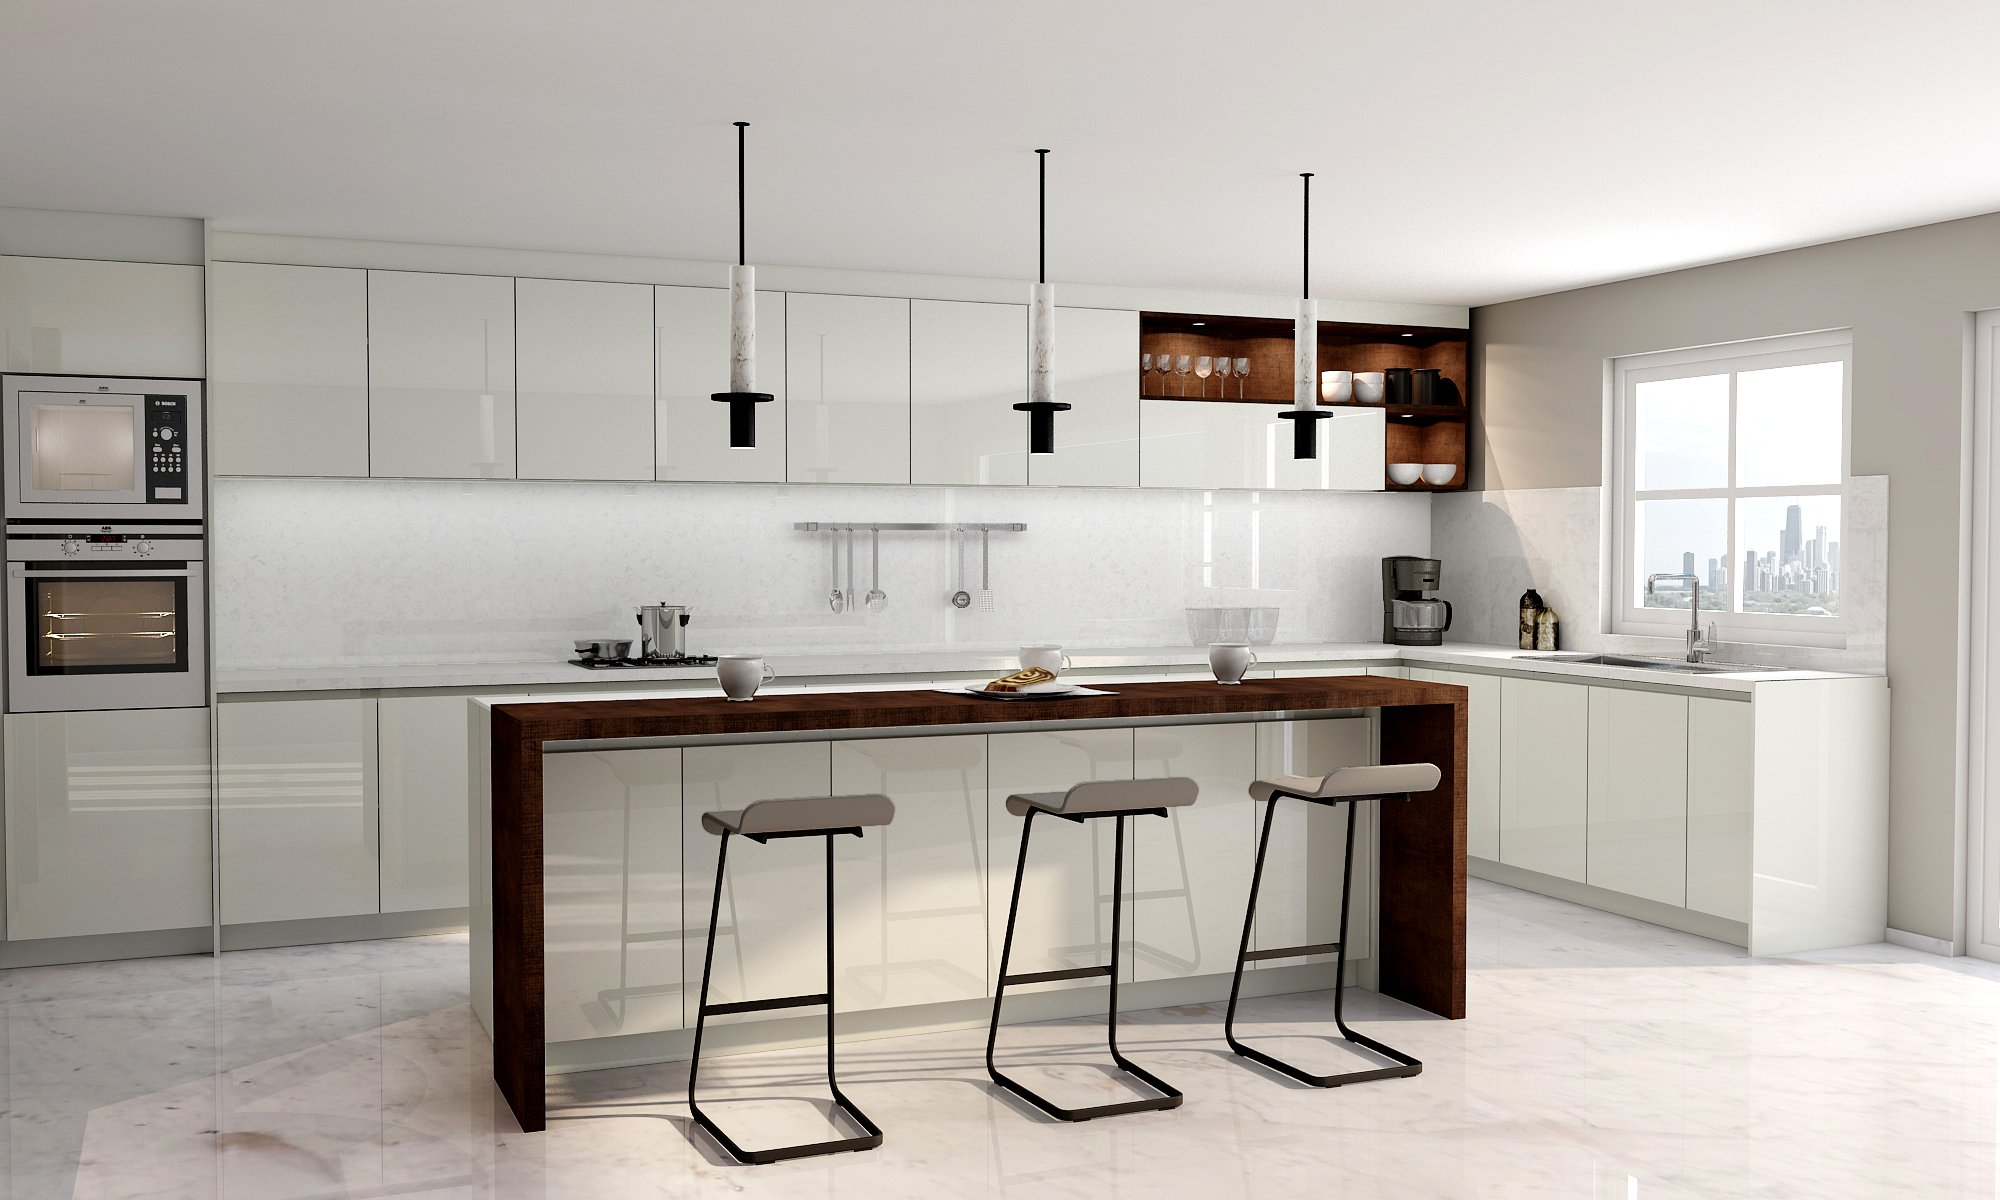 Handlless Modern Kitchen in Lights Grey Gloss With Island and Breakfast Bar